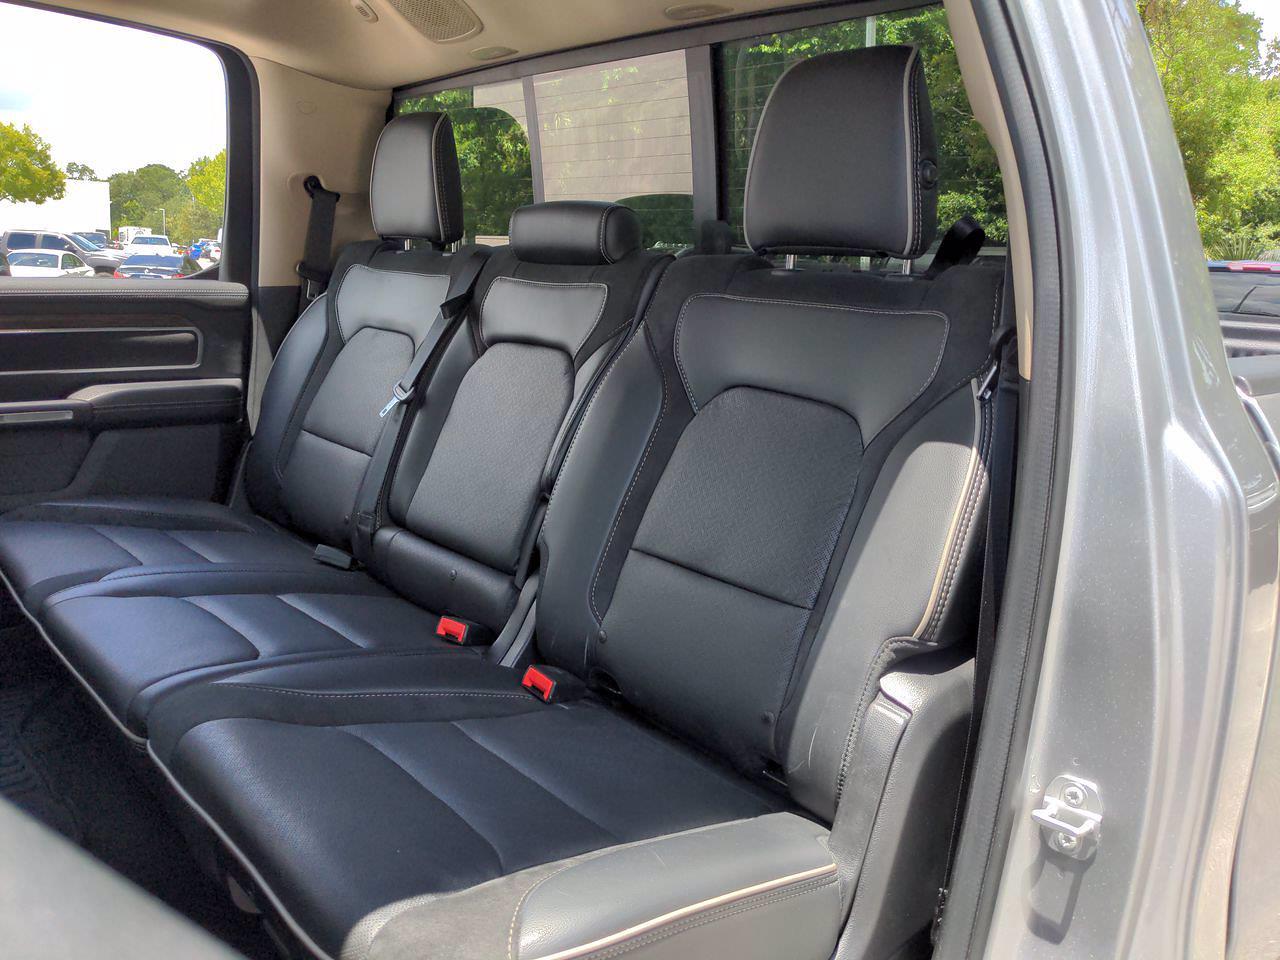 2019 Ram 1500 Crew Cab 4x4, Pickup #SA89907 - photo 33